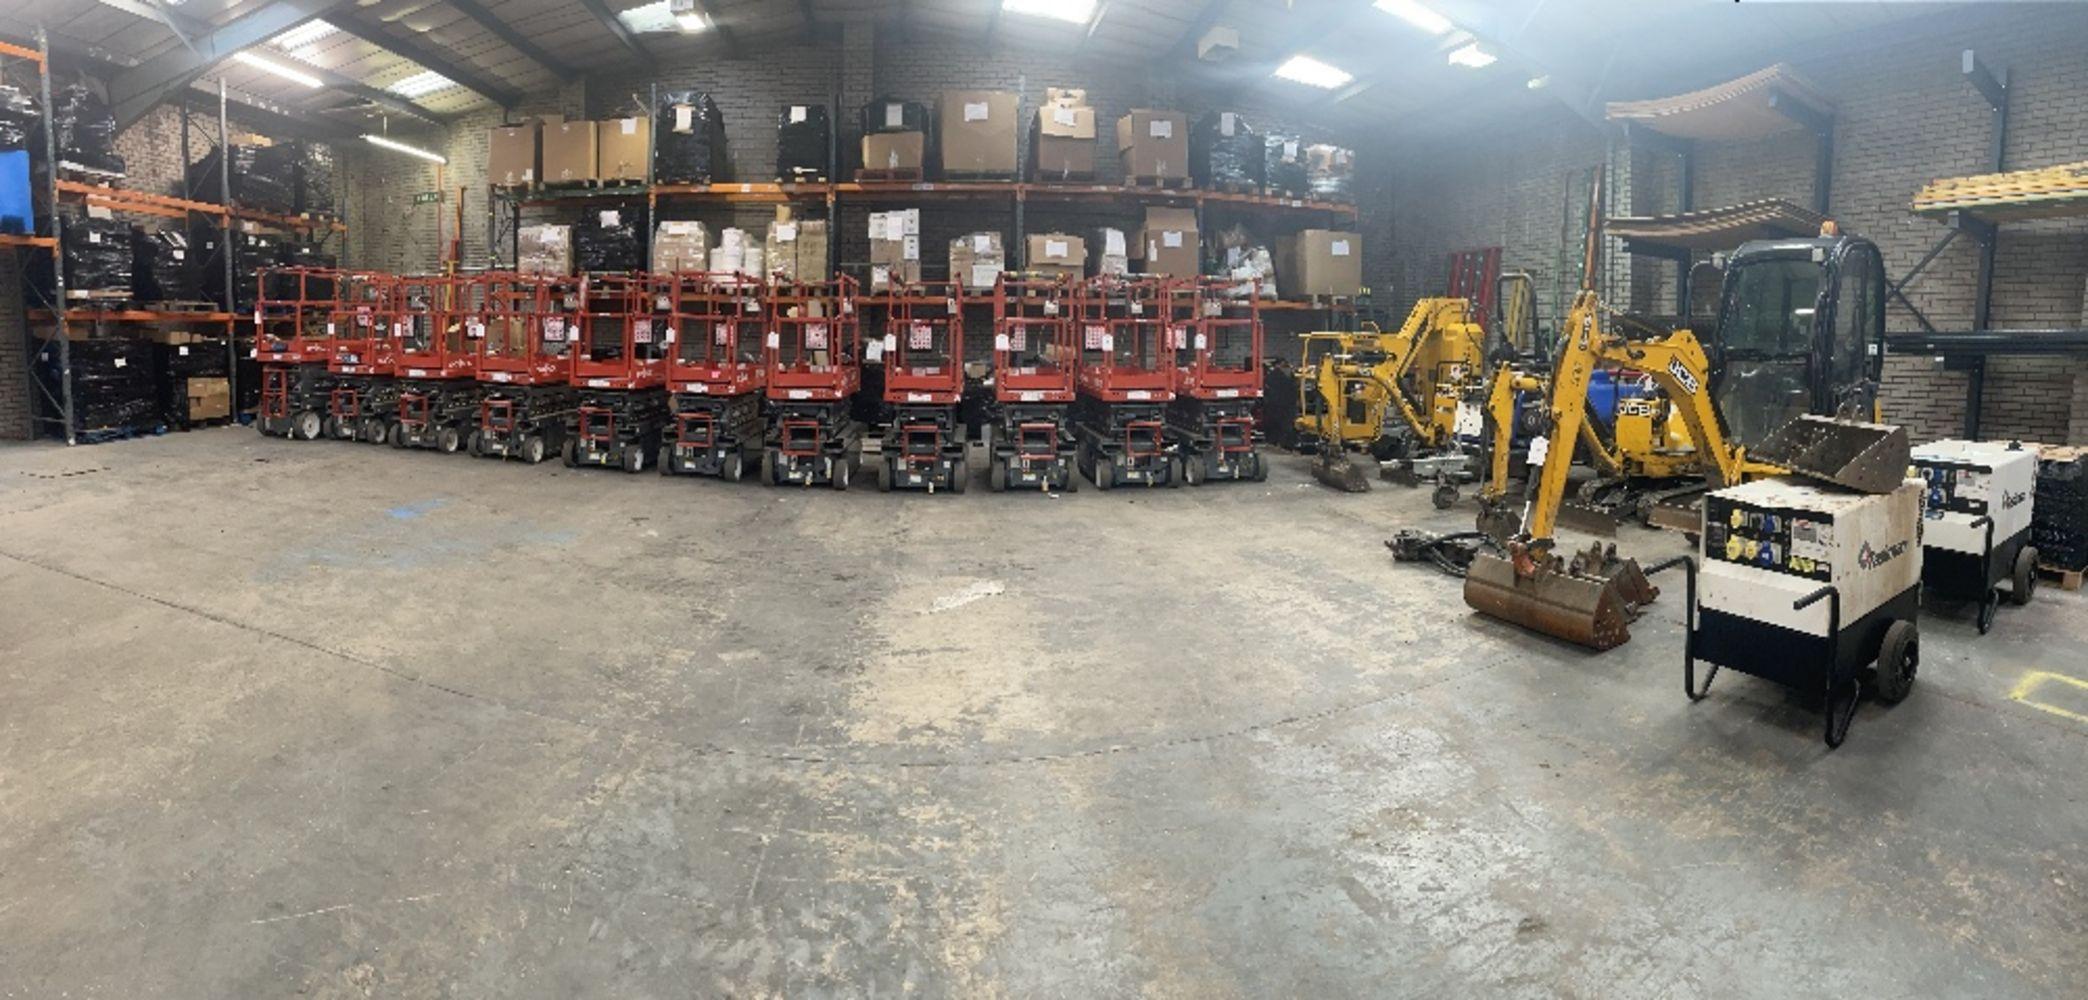 Plant & Machinery Sale | Skyjack Scissor Lifts | JCB Mini Excavator/Diggers | Haulotte Platform Lift | Brendan Bowsers Pressure Washer